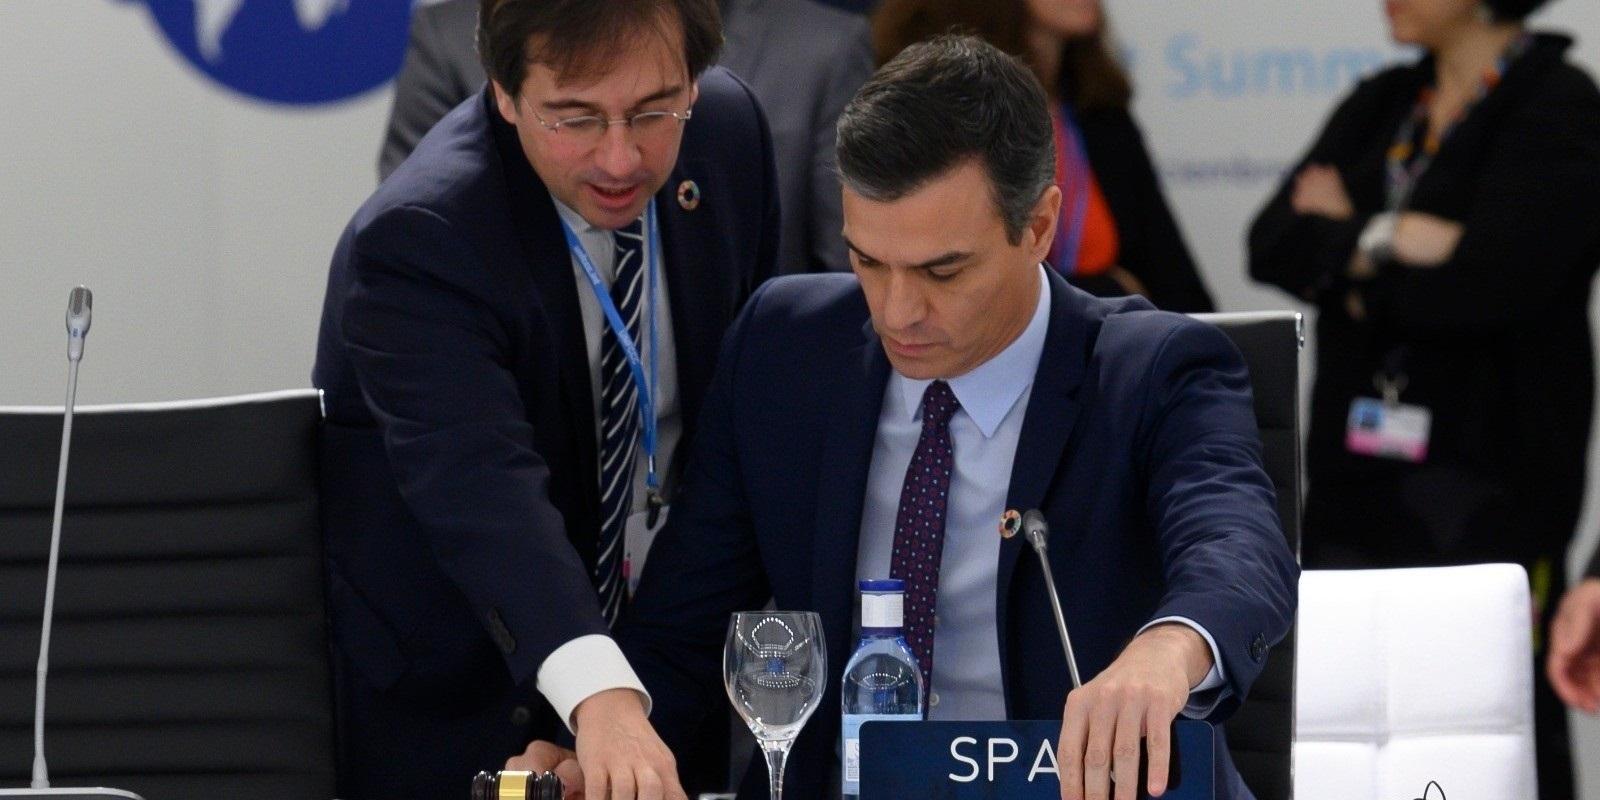 José Manuel Albares ejerció de sherpa de Sánchez en las cumbres internacionales en la pasada legislatura. / EP